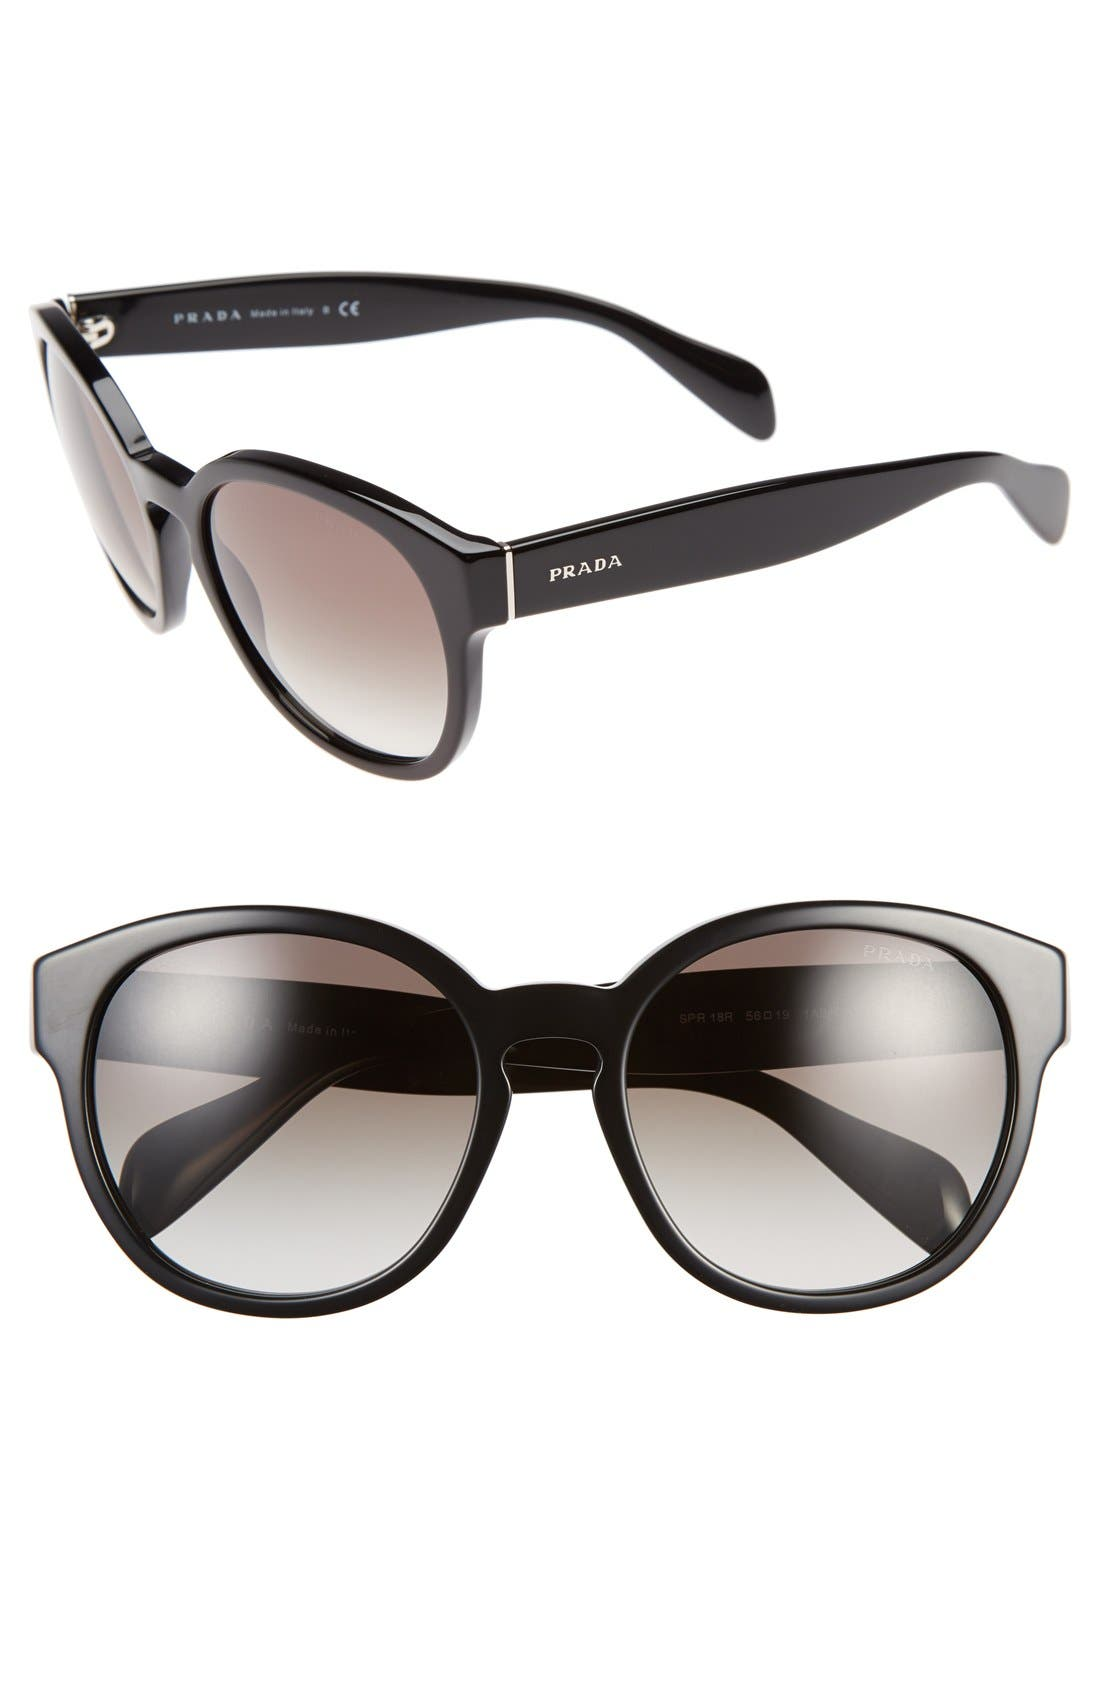 56mm Keyhole Sunglasses,                             Main thumbnail 1, color,                             Black